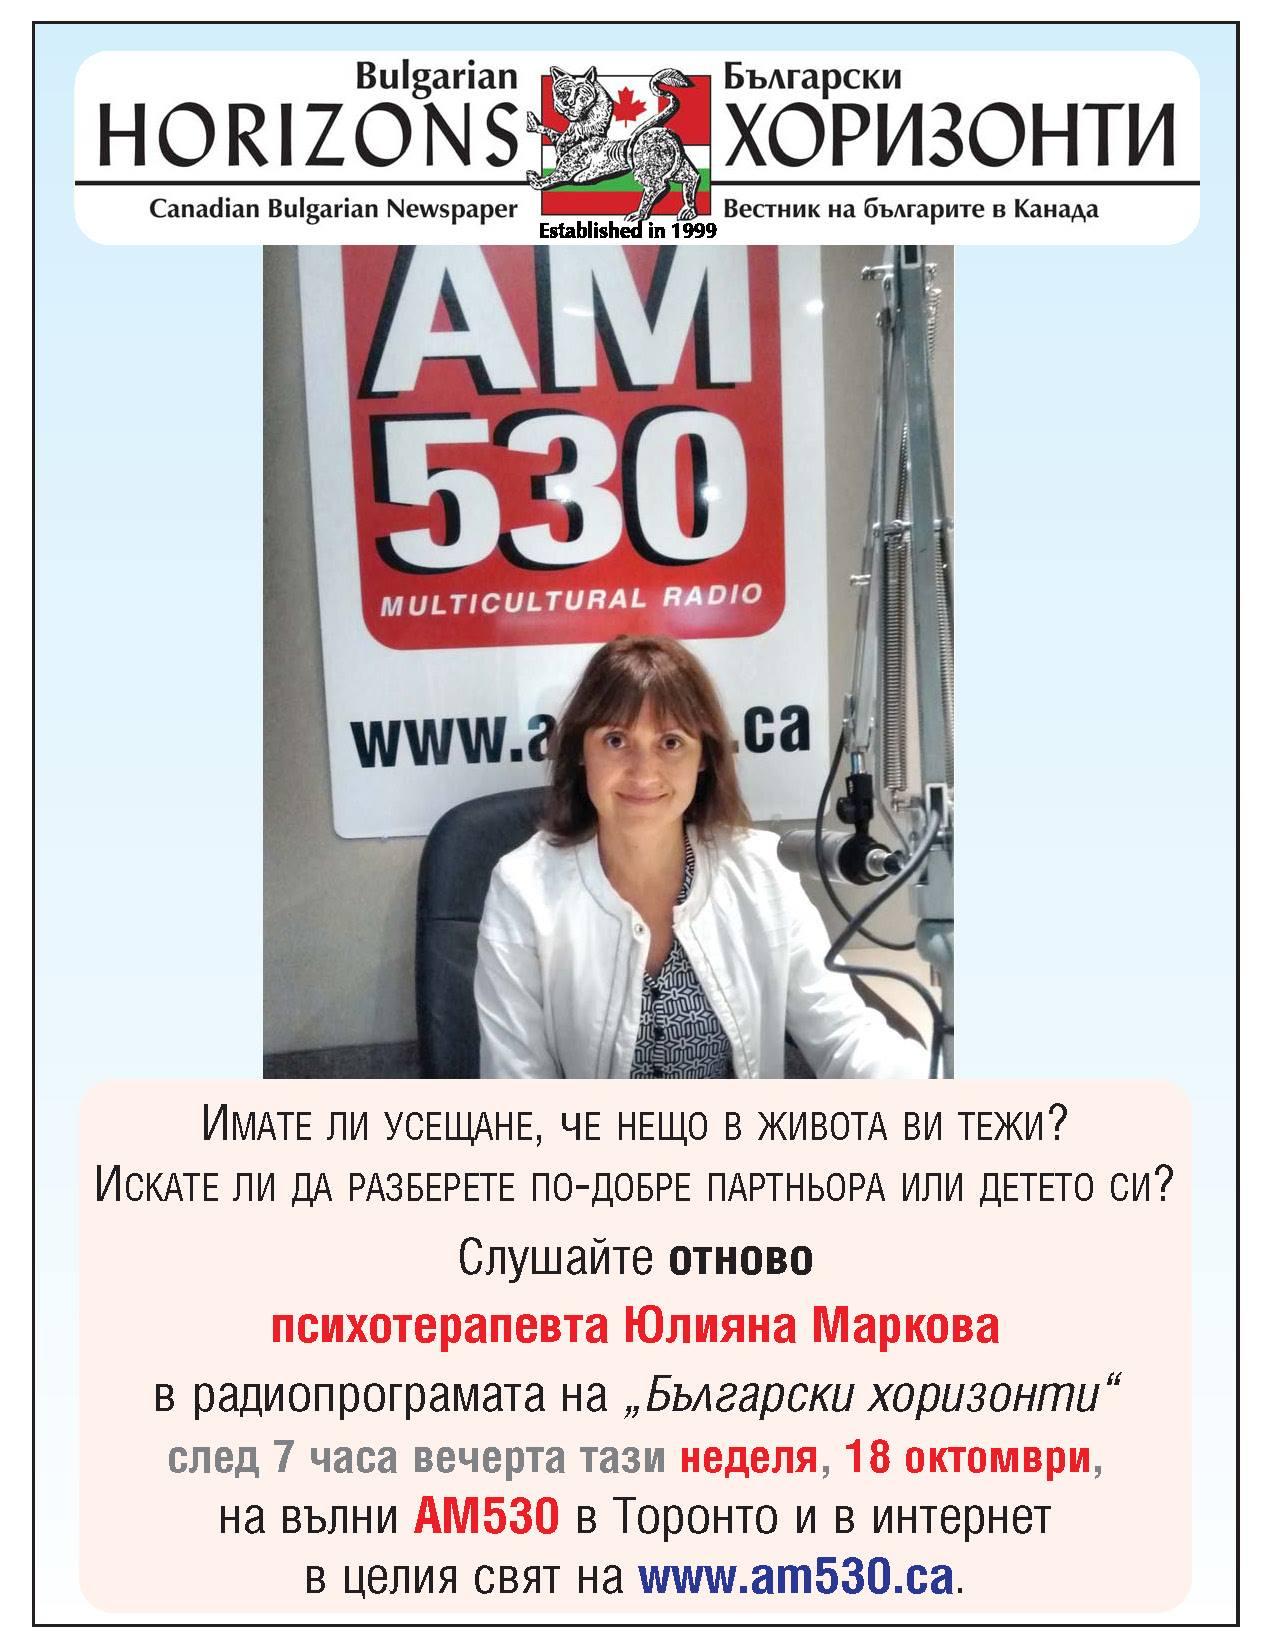 Uliyana Markova on radio with Bulgarian Horizons